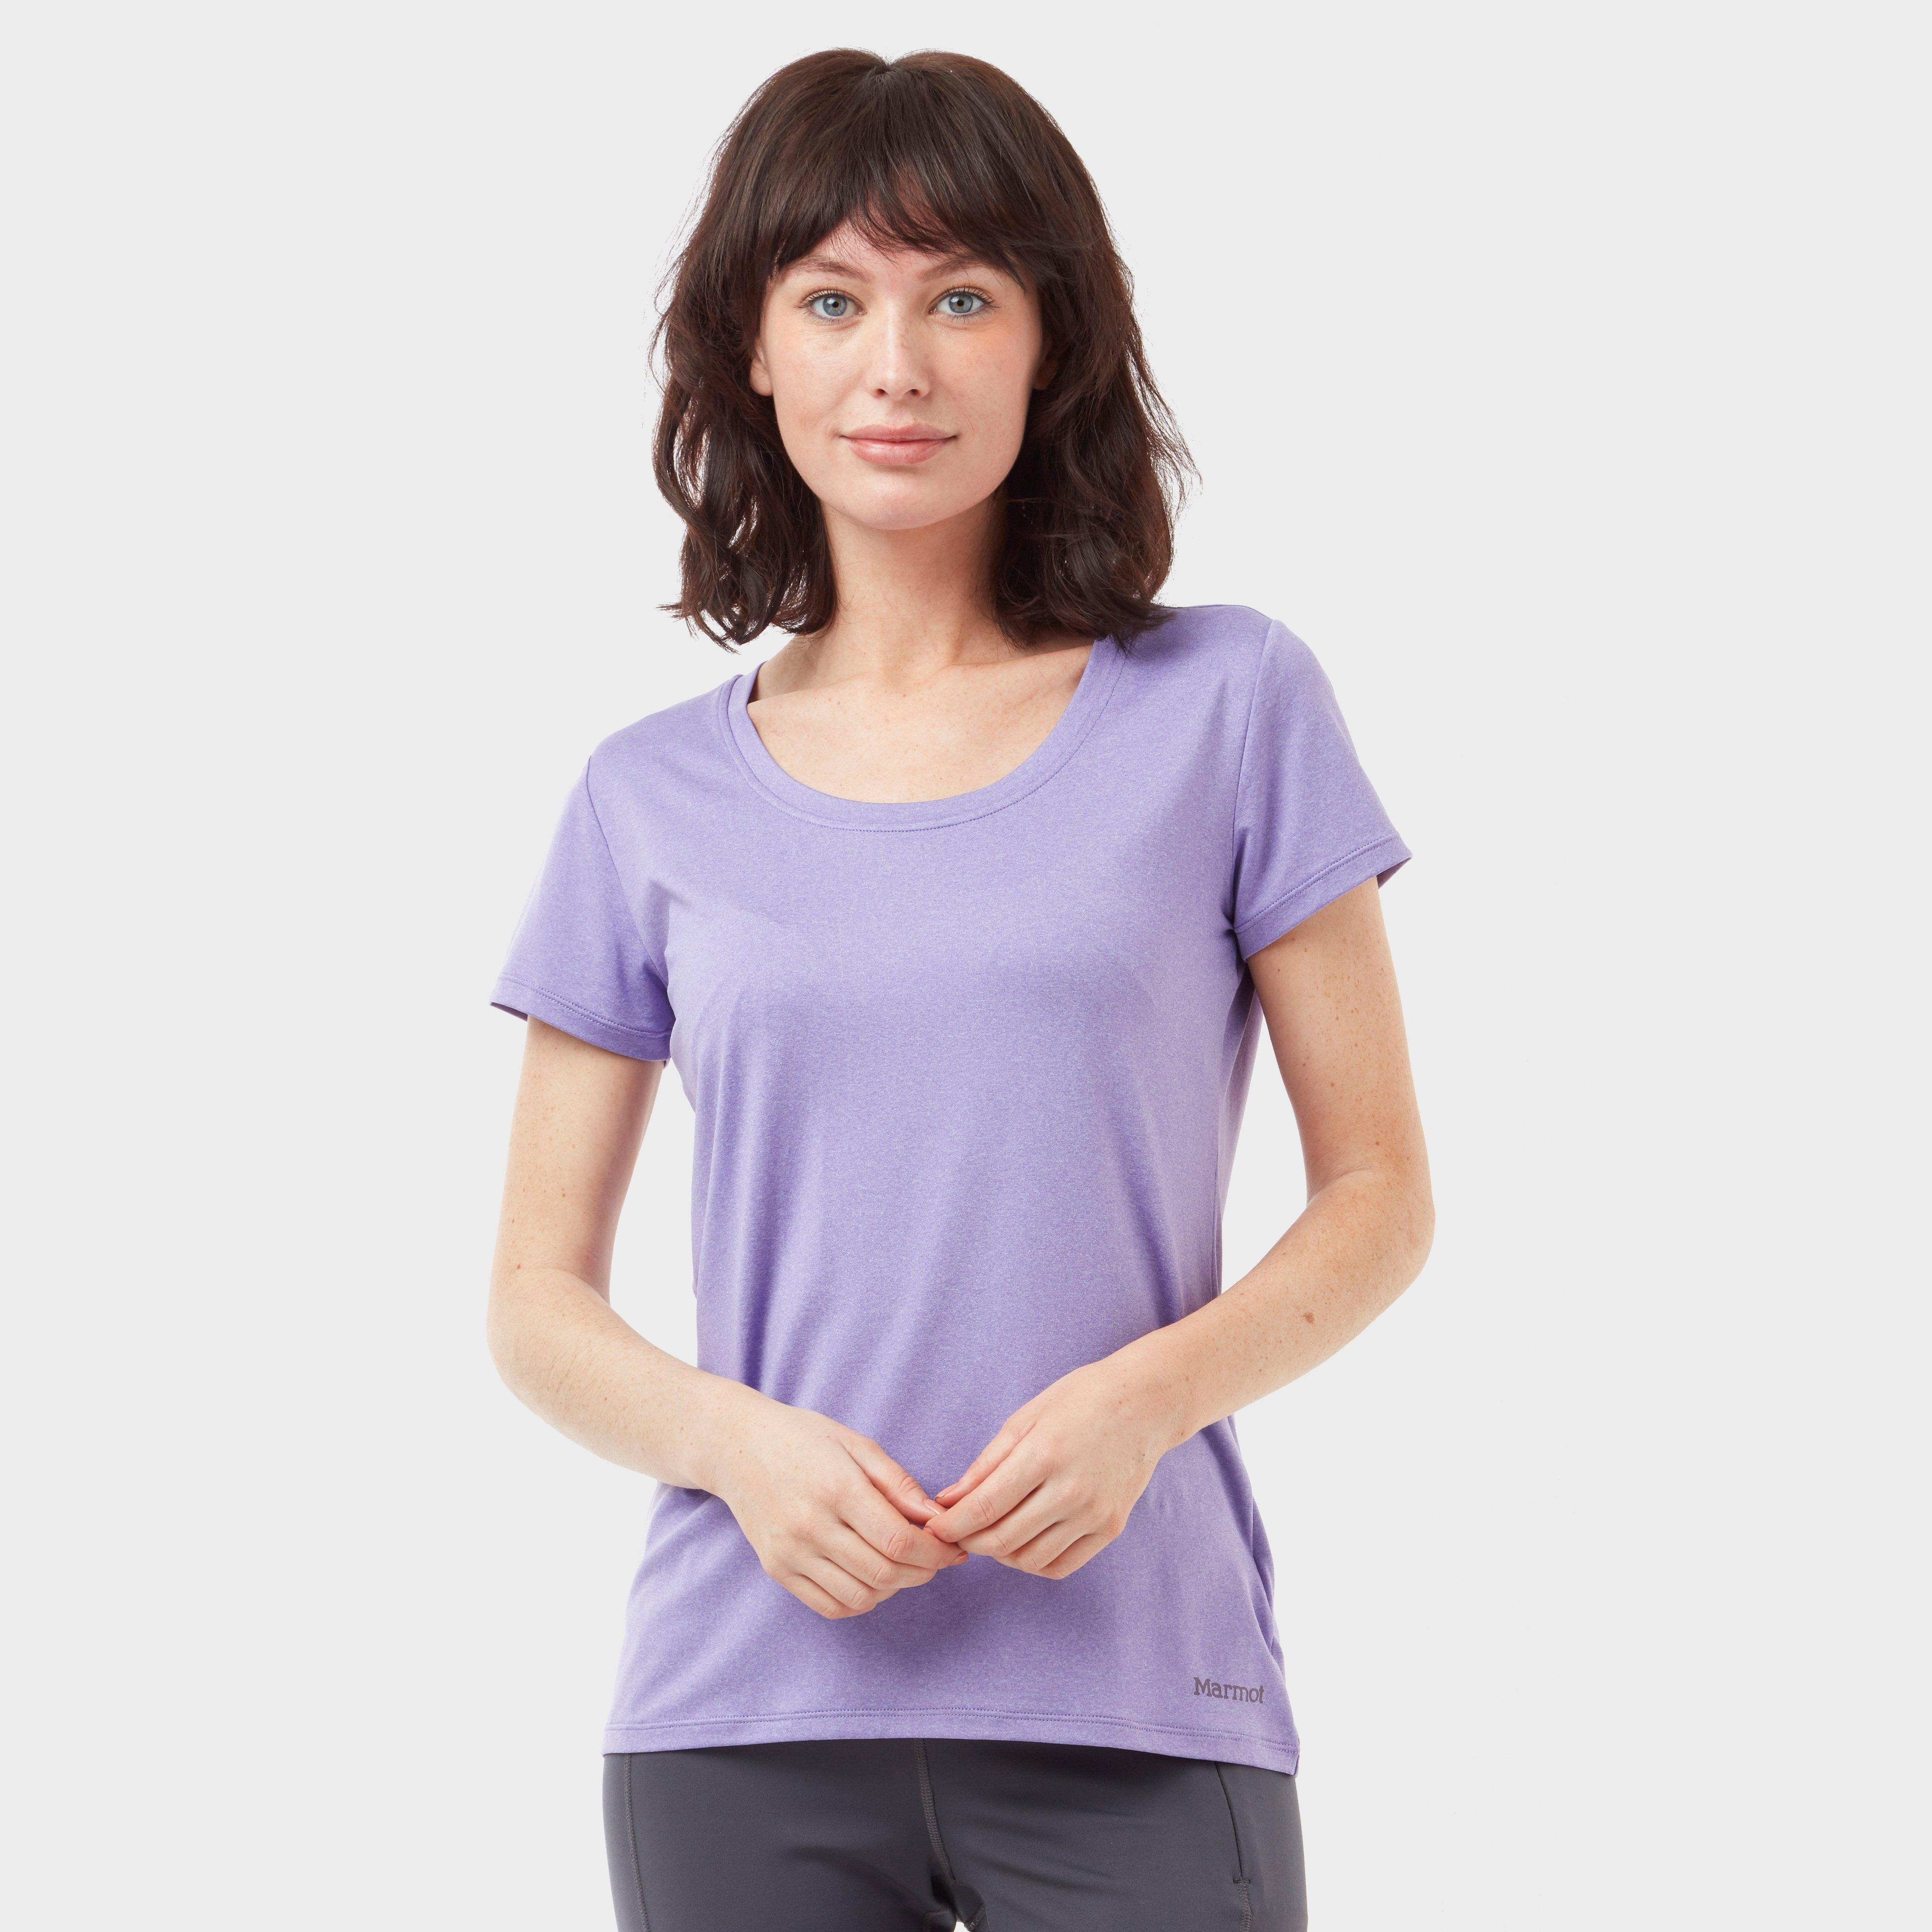 Marmot Women's All Around Tee, Purple